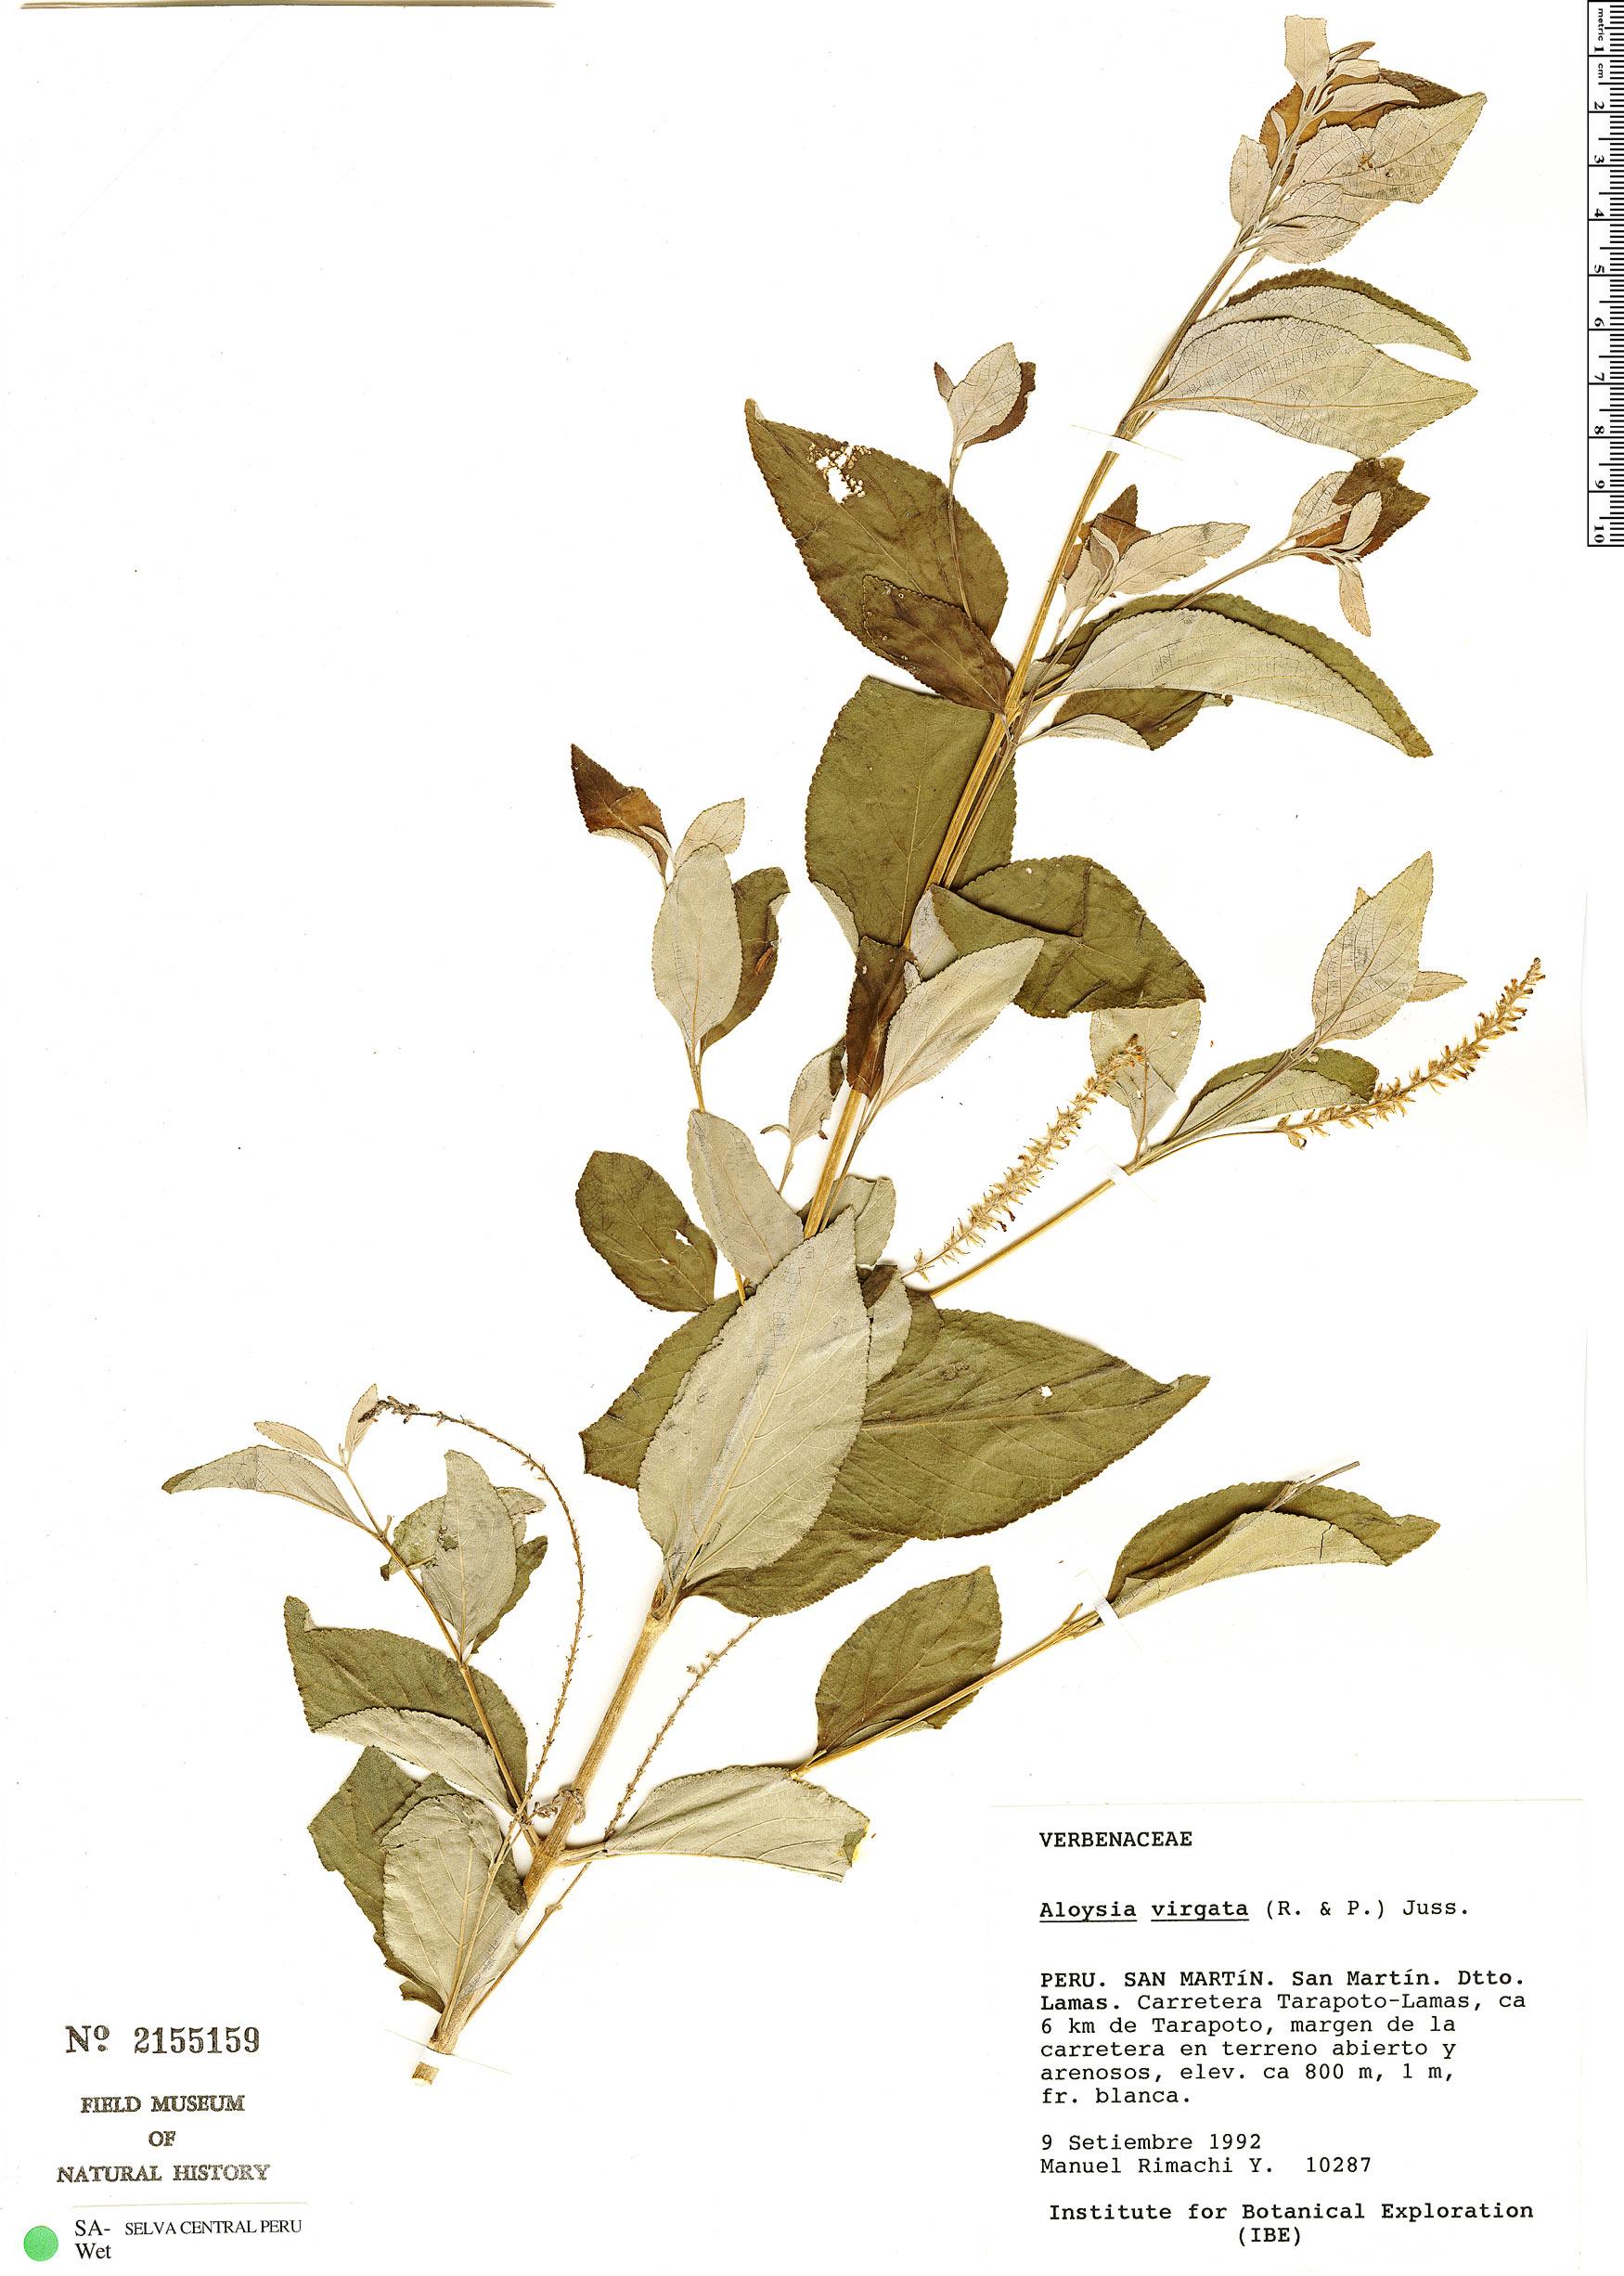 Specimen: Aloysia virgata